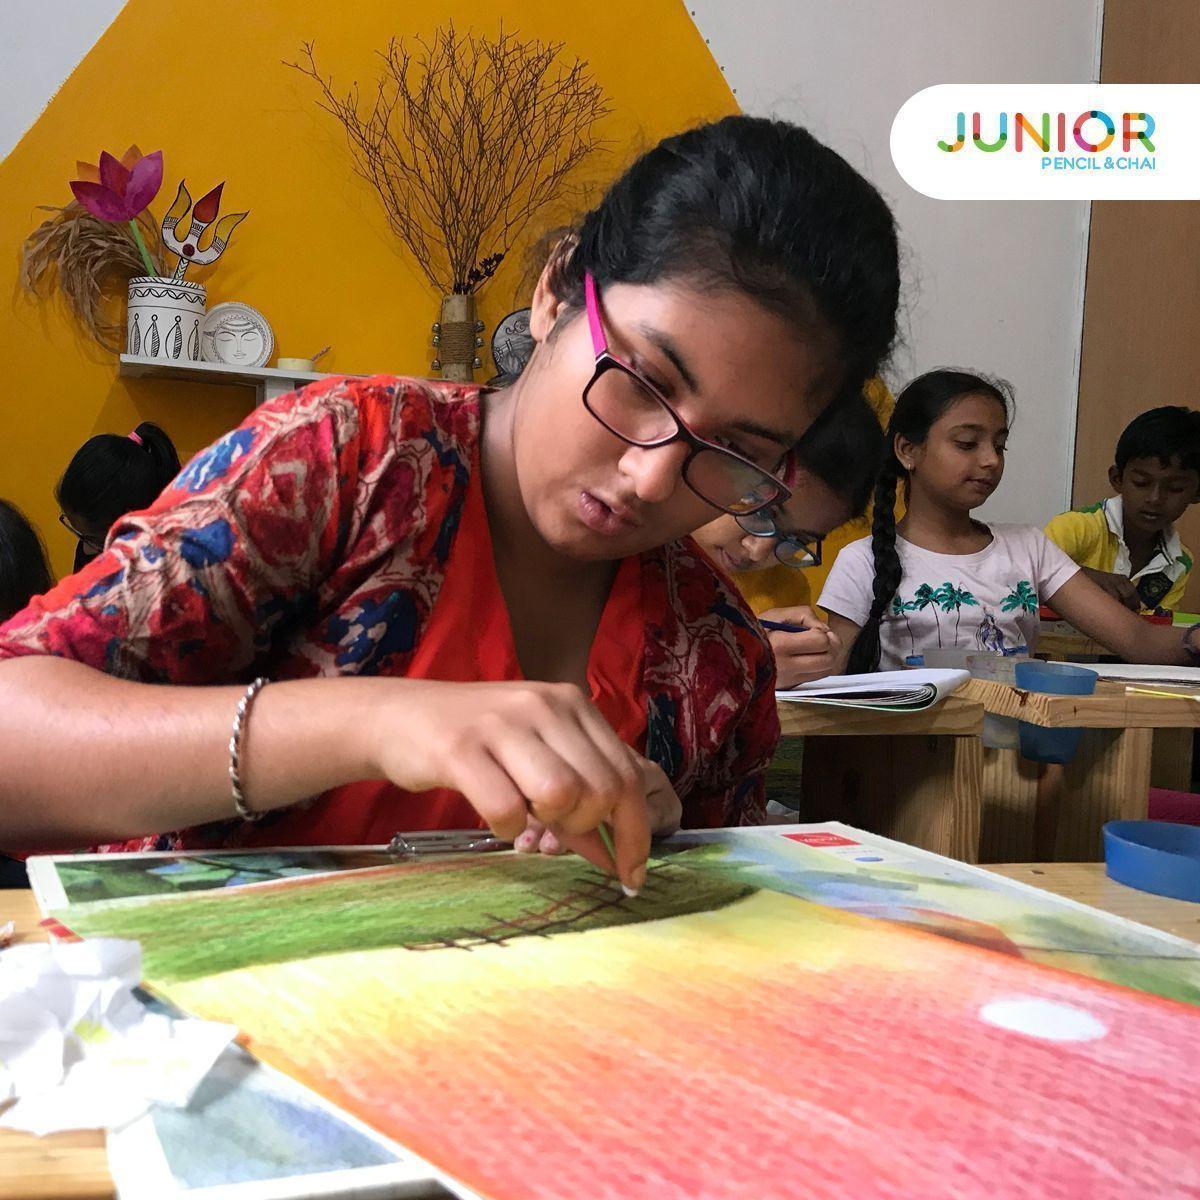 Shreyanka Engrossed In Her Artwork At Junior Pencil Chai Sow